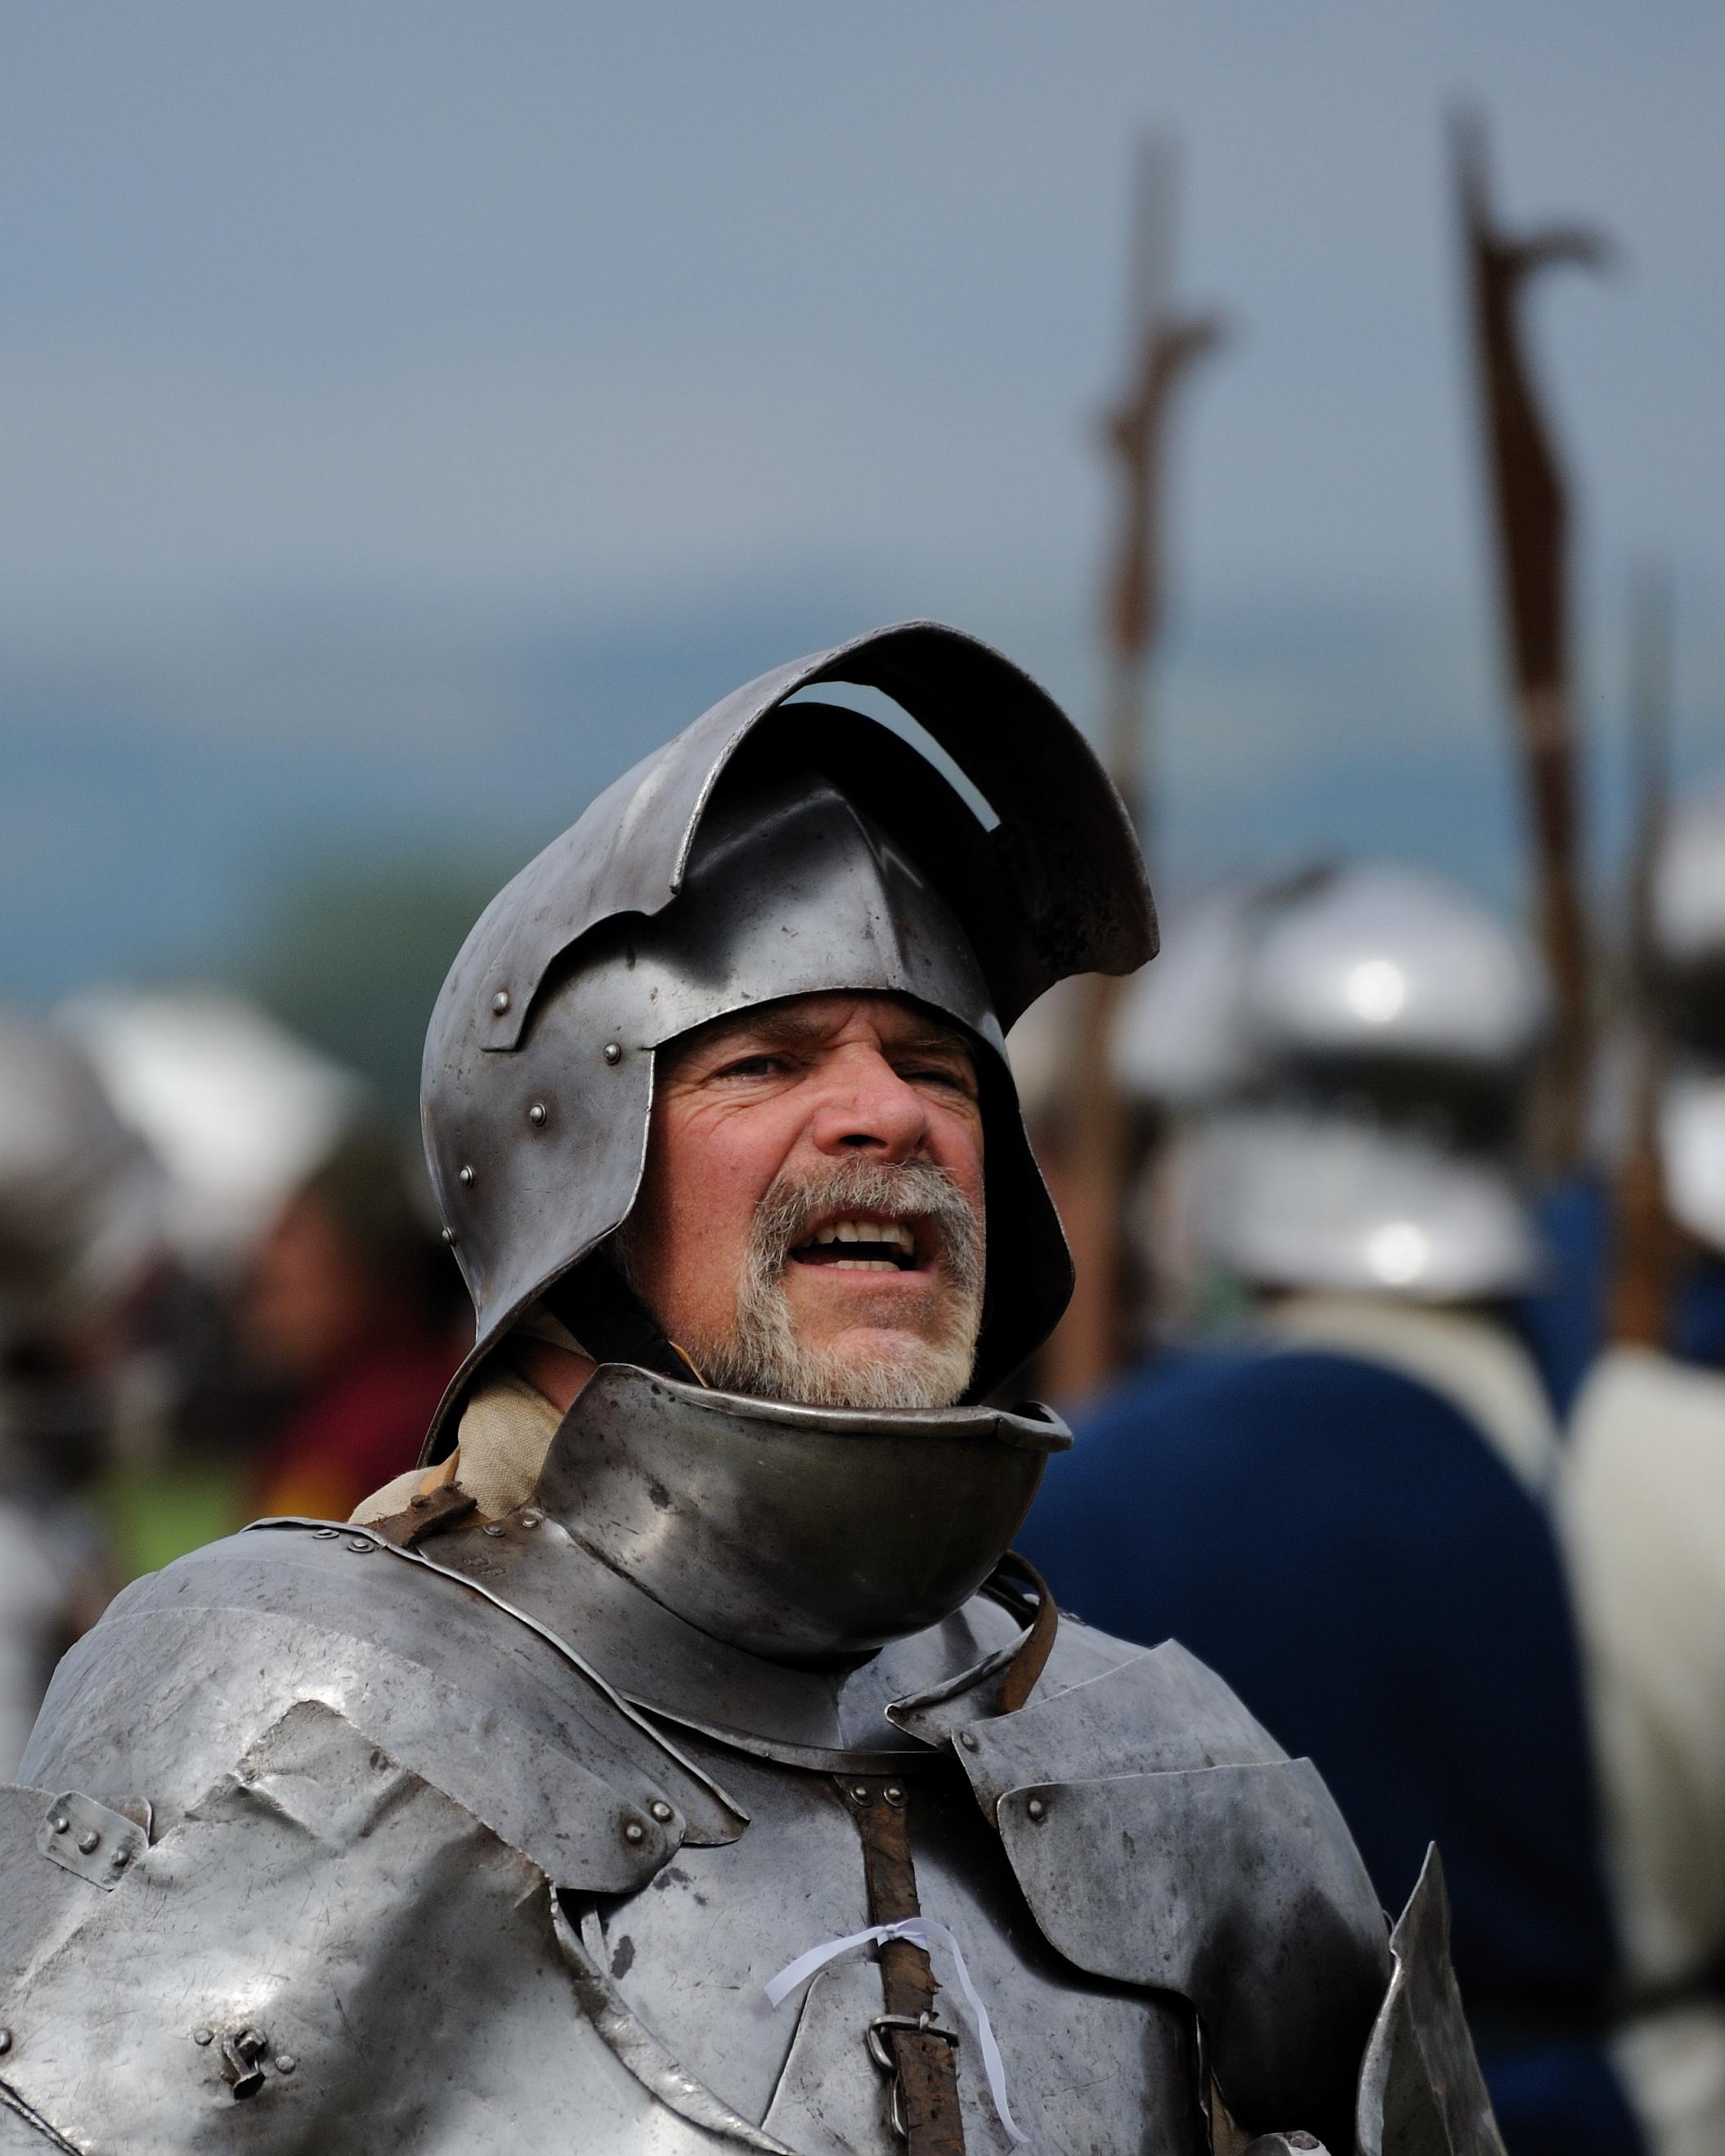 Head shot of a knight in shining armor